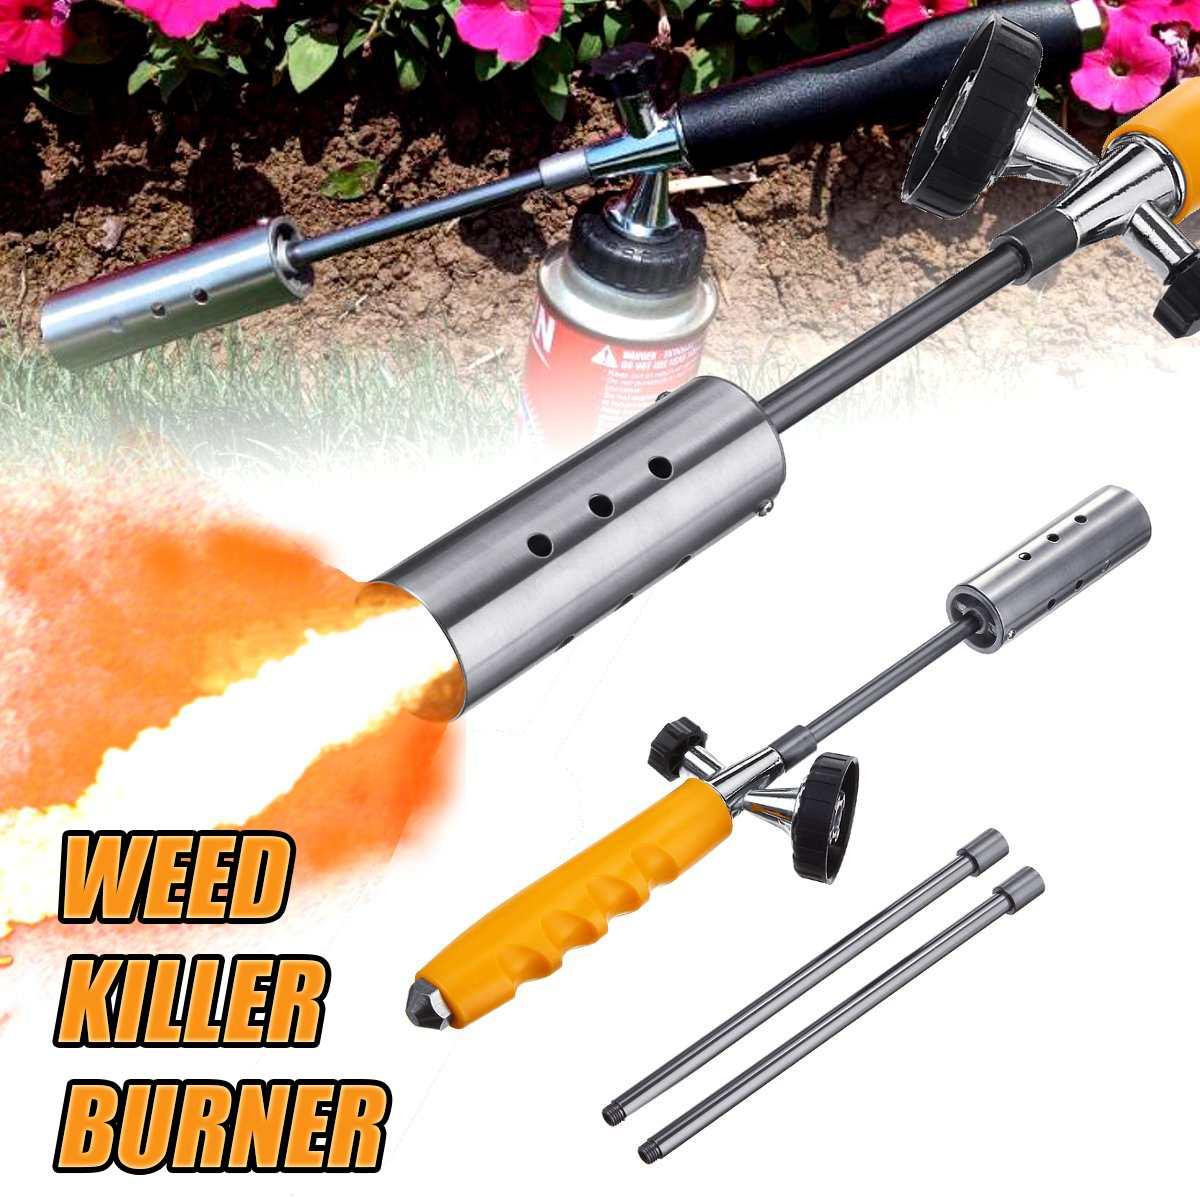 Waterproof Weeding Fires Guns Grass Burner Blowtorch Multipurpose Gas Torch Welding Gas Torch For Outdoor Picnic BBQ & Weeders